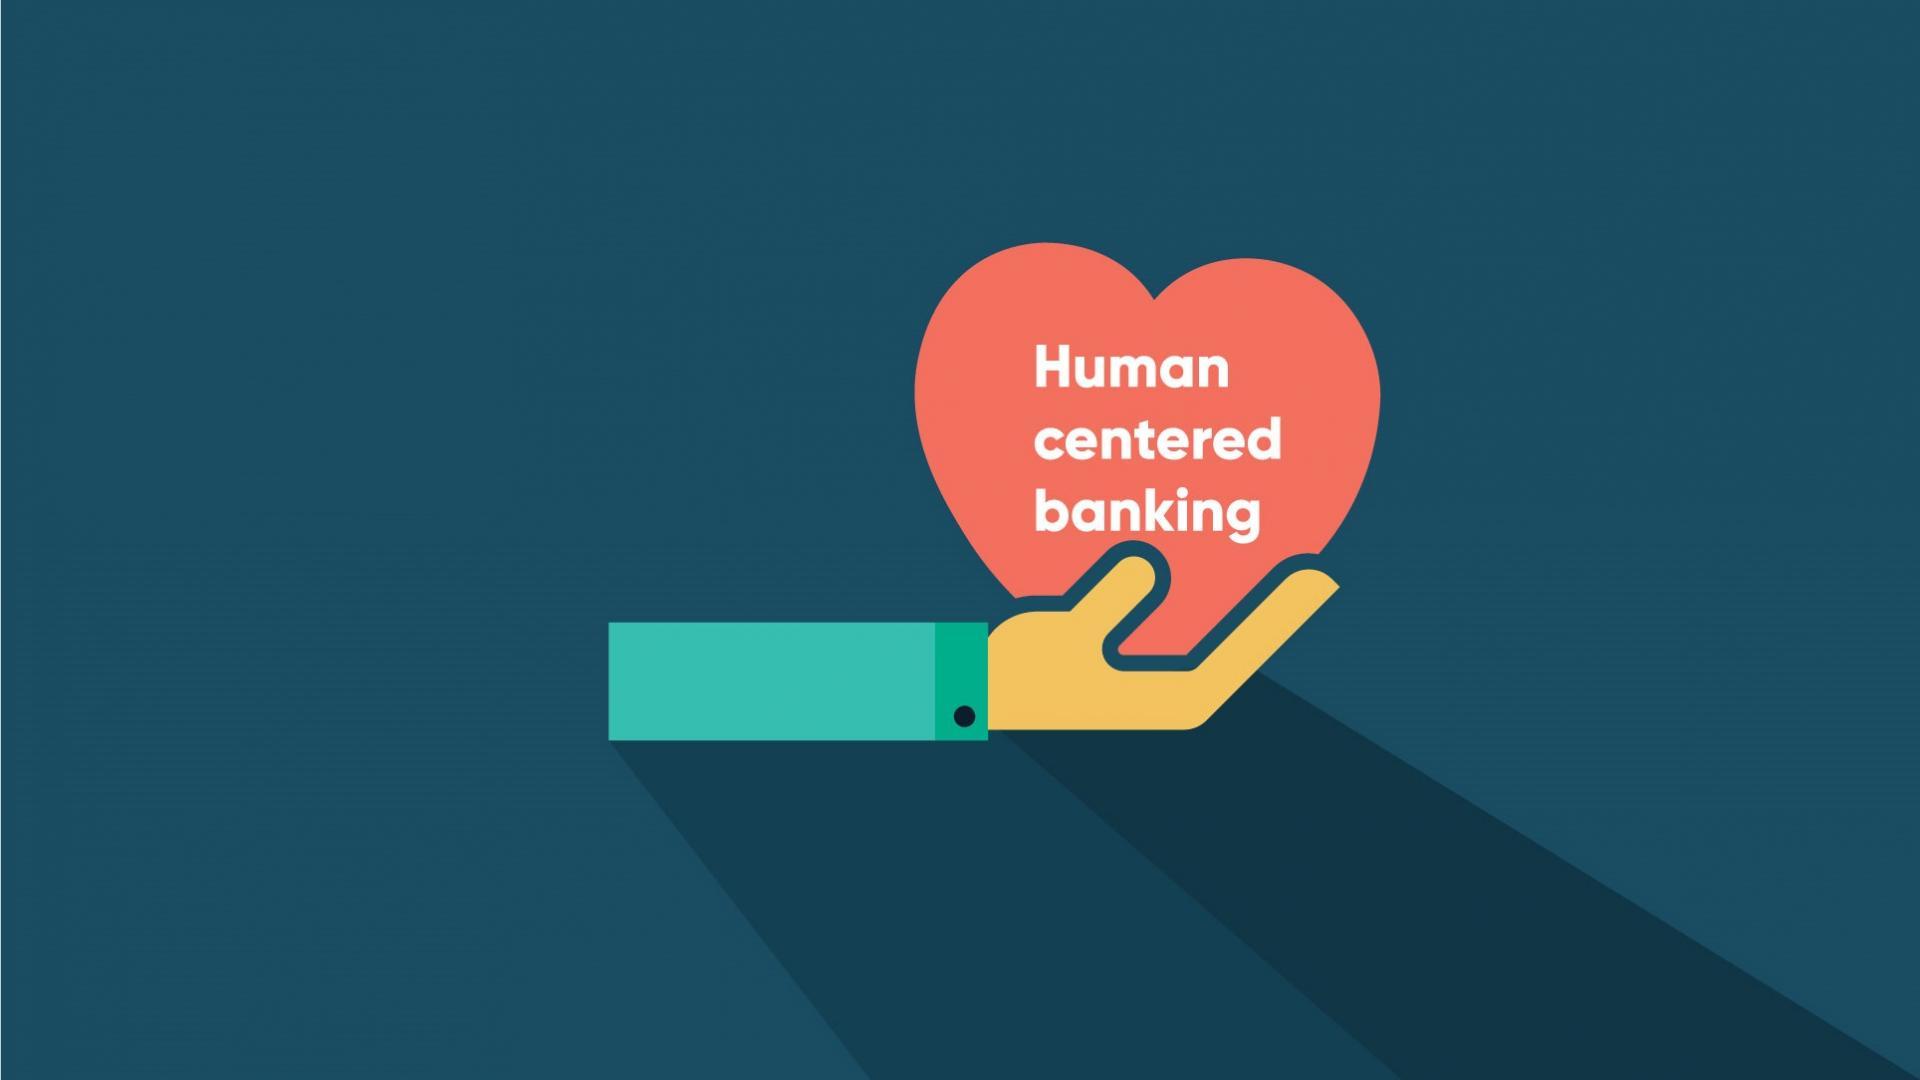 Community Response Human-Centered banking